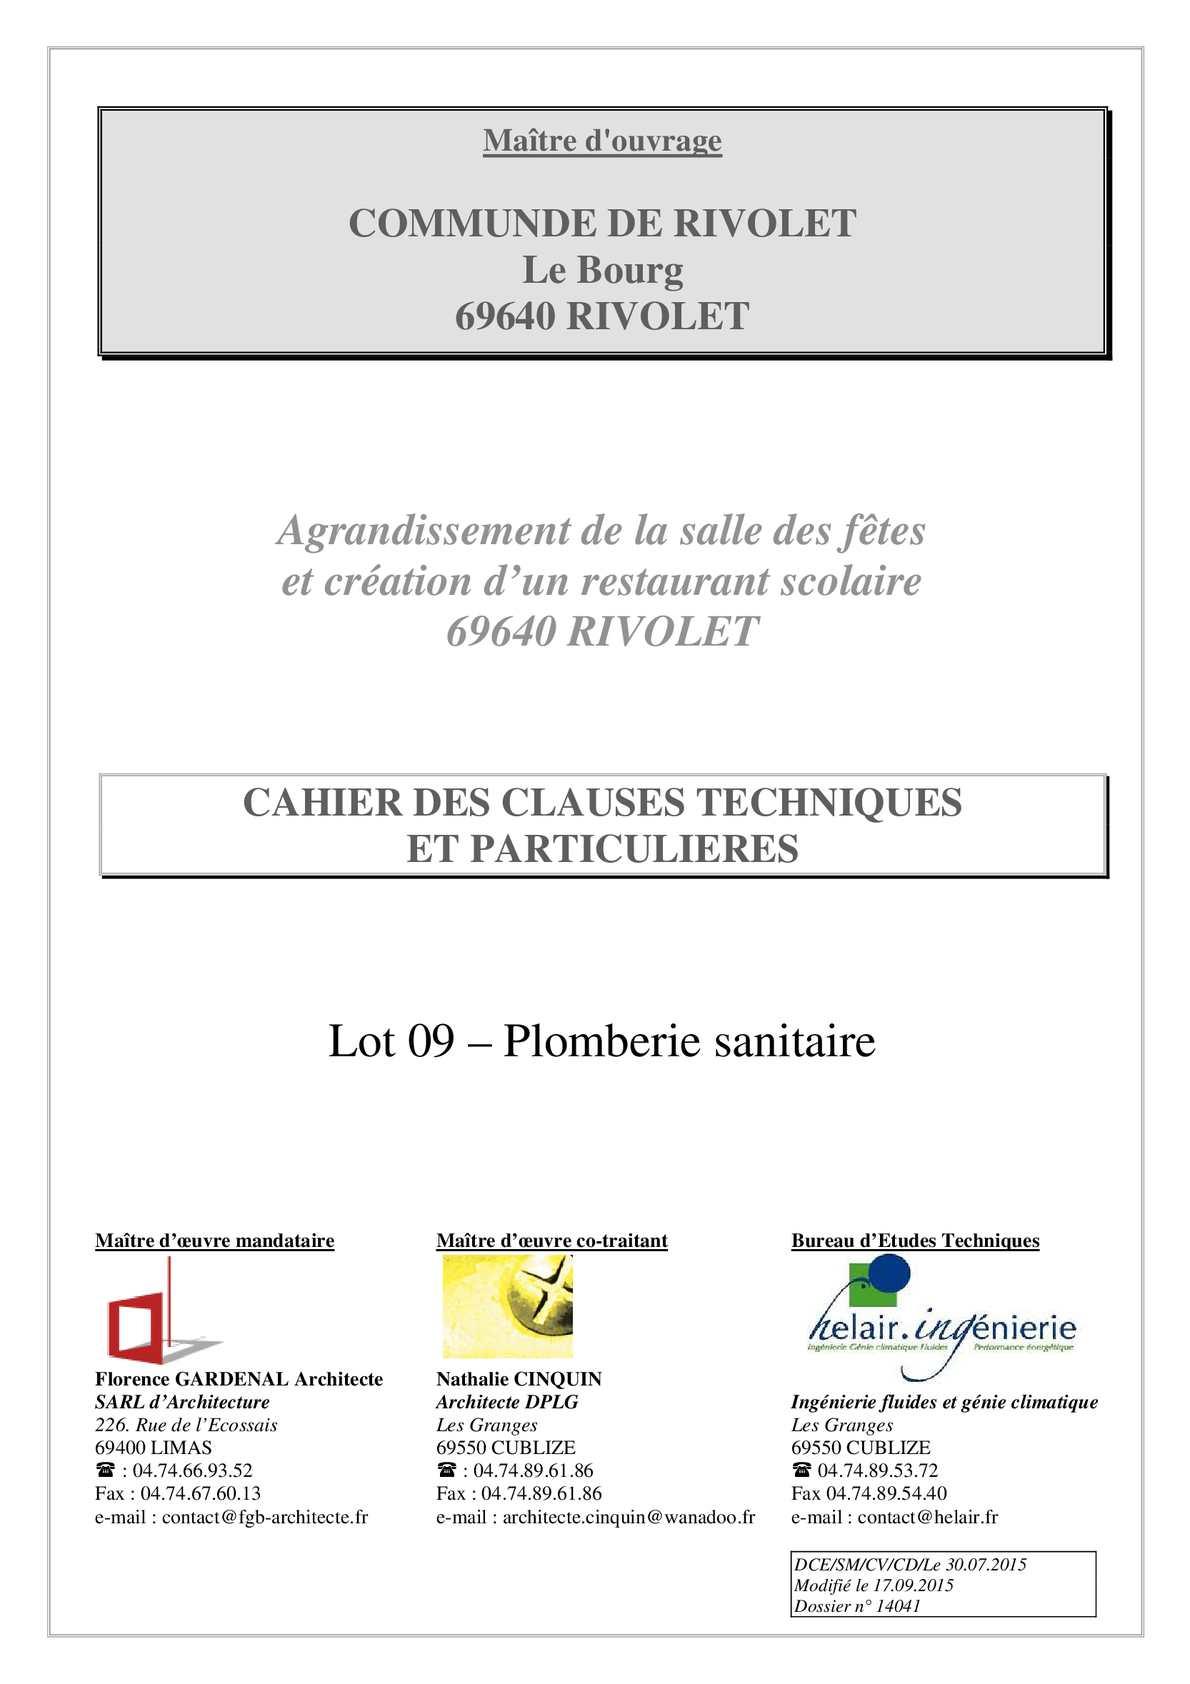 calam o rivolet cctp lot 09 plomberie sanitaire le 30 07